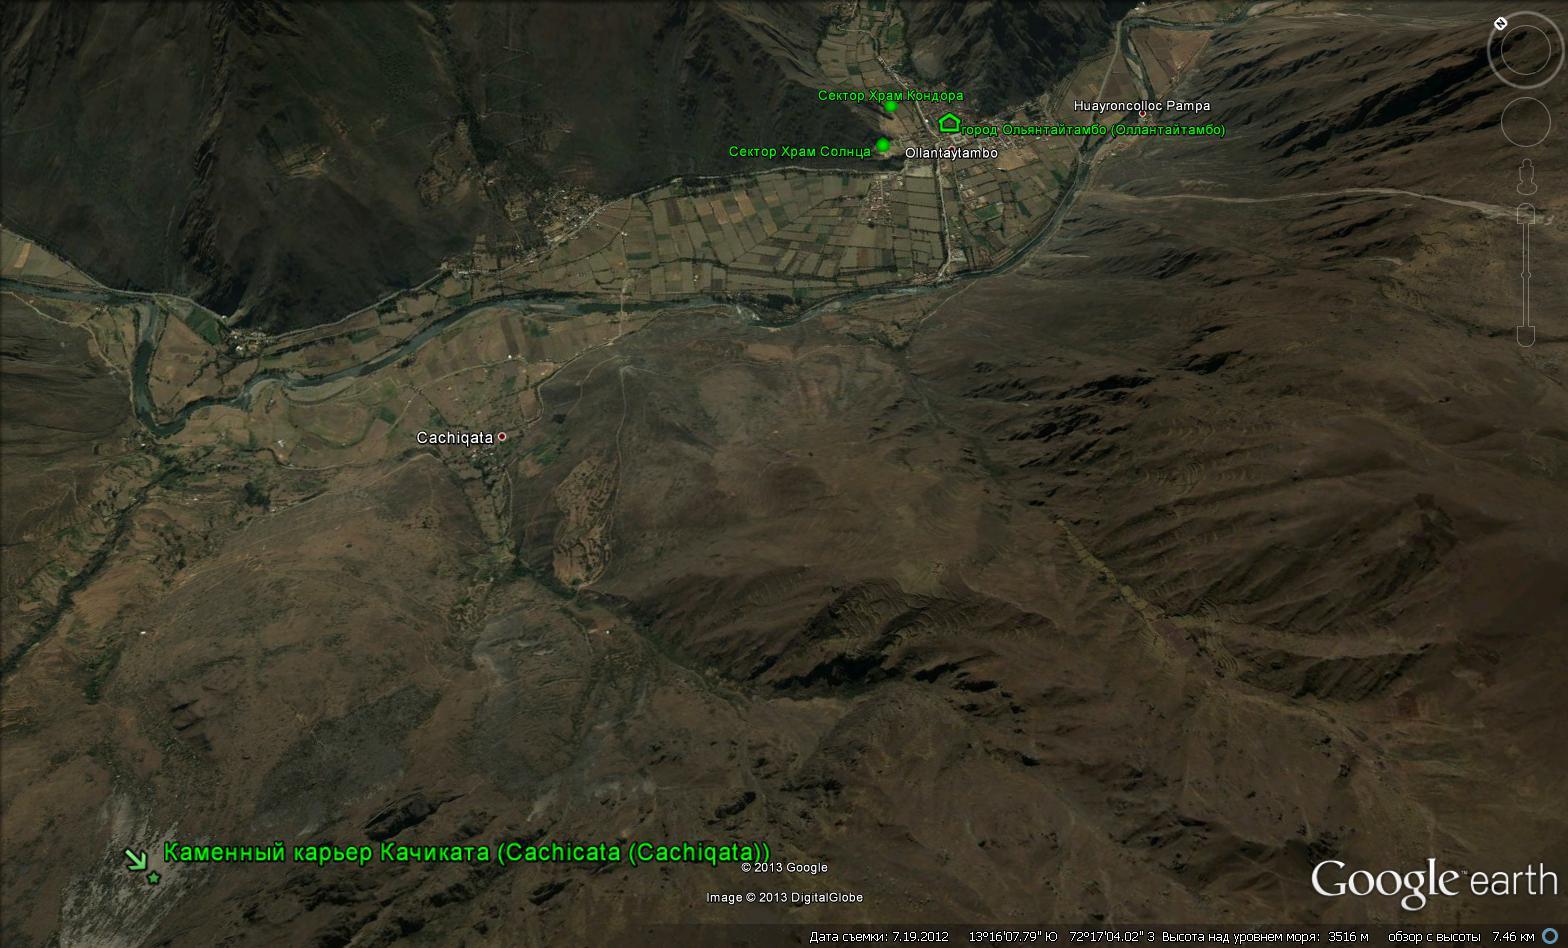 Вид на город Ольянтайтамбо с вершины террас, которые повелел построить император Пачакути (Pachacuti). (фото - http://en.wikipedia.org/wiki/File:Ollantaytambo1.jpg by Xauxa)